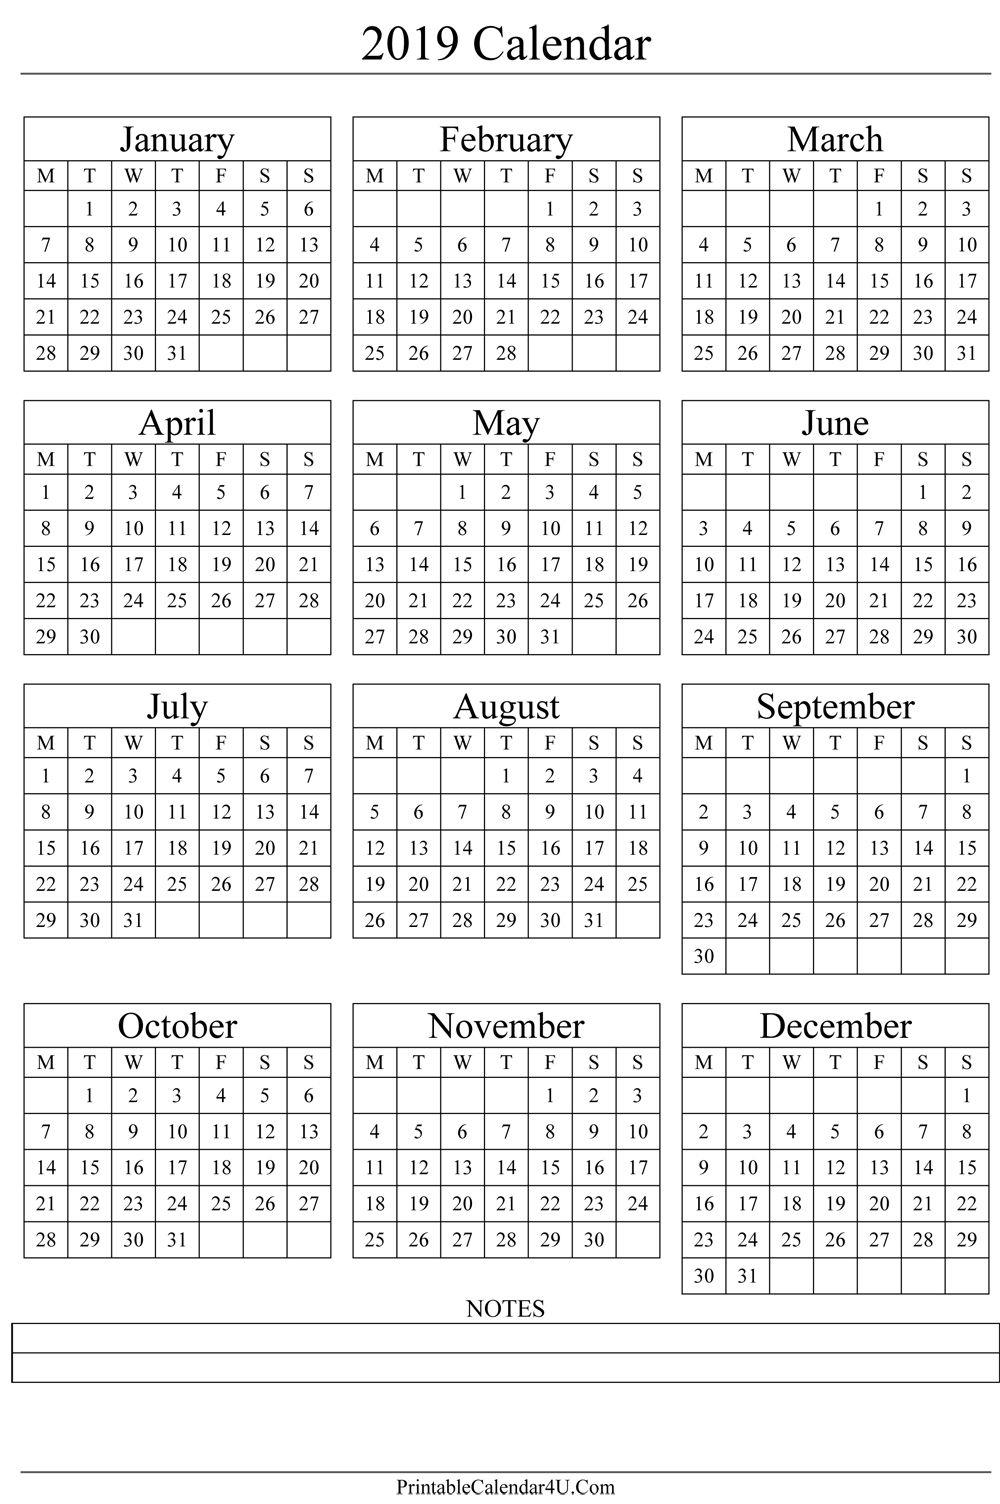 Annual Calendar 2019 Portrait Printable Calendar 2017 | Gift Ideas in Free Yearly 5.5 X 8.5 Calendar 2020